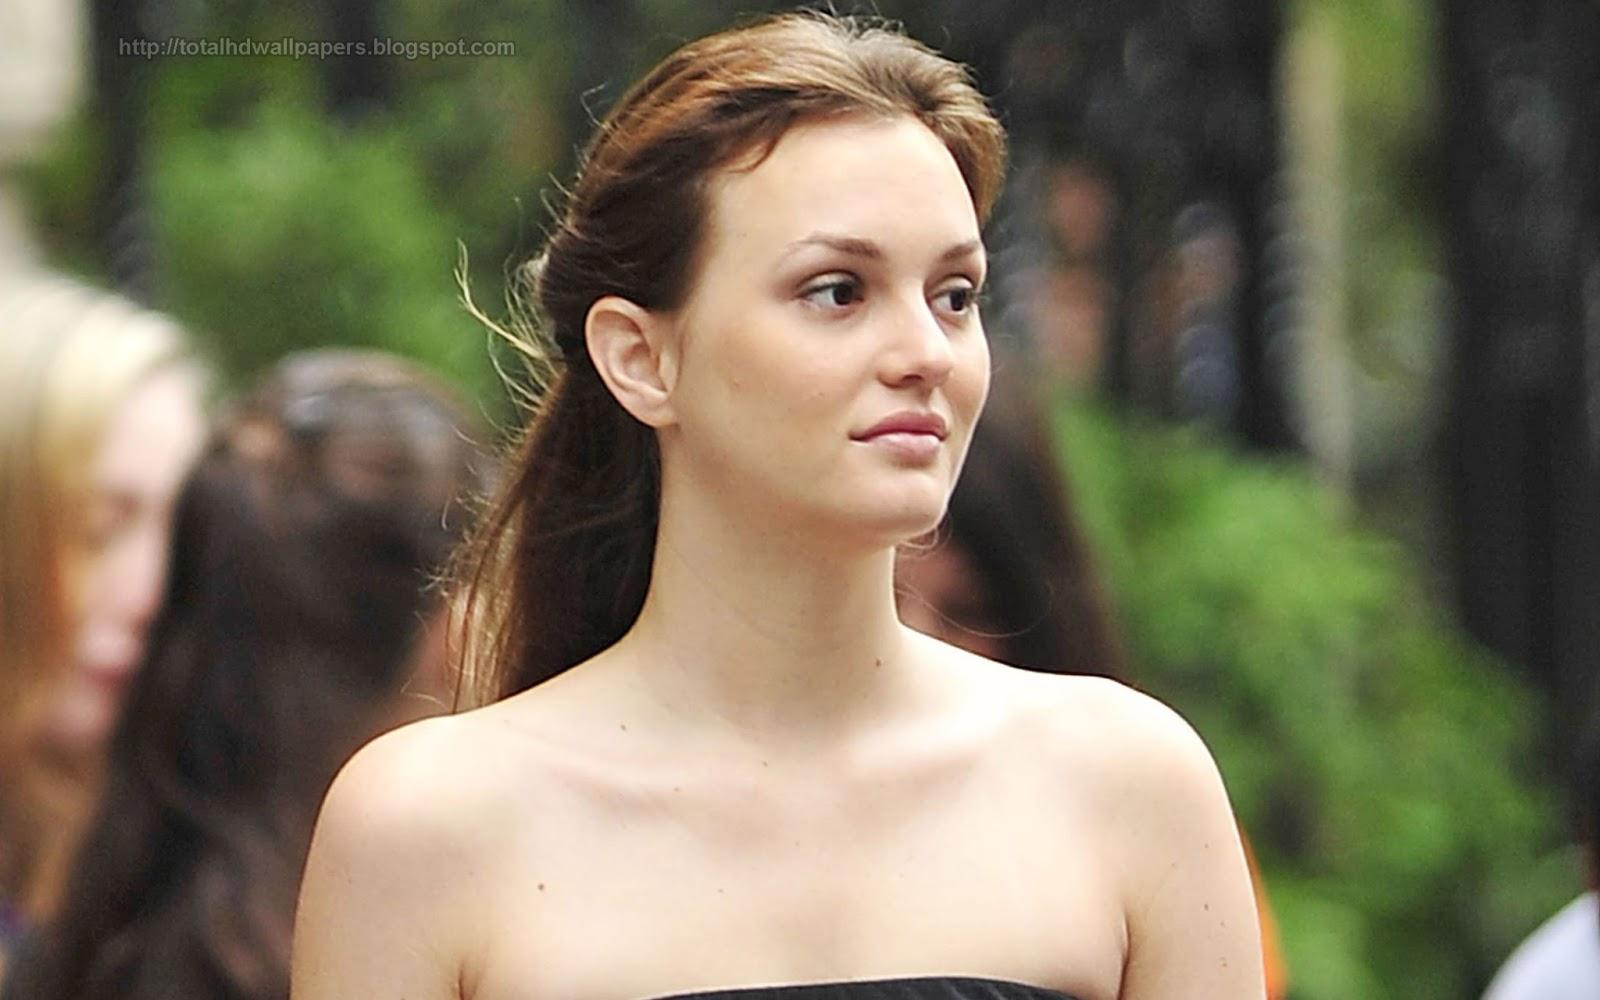 HD Wallpapers Hollywood Actress HD Wallpapers Hollywood Actress HD 1600x1000